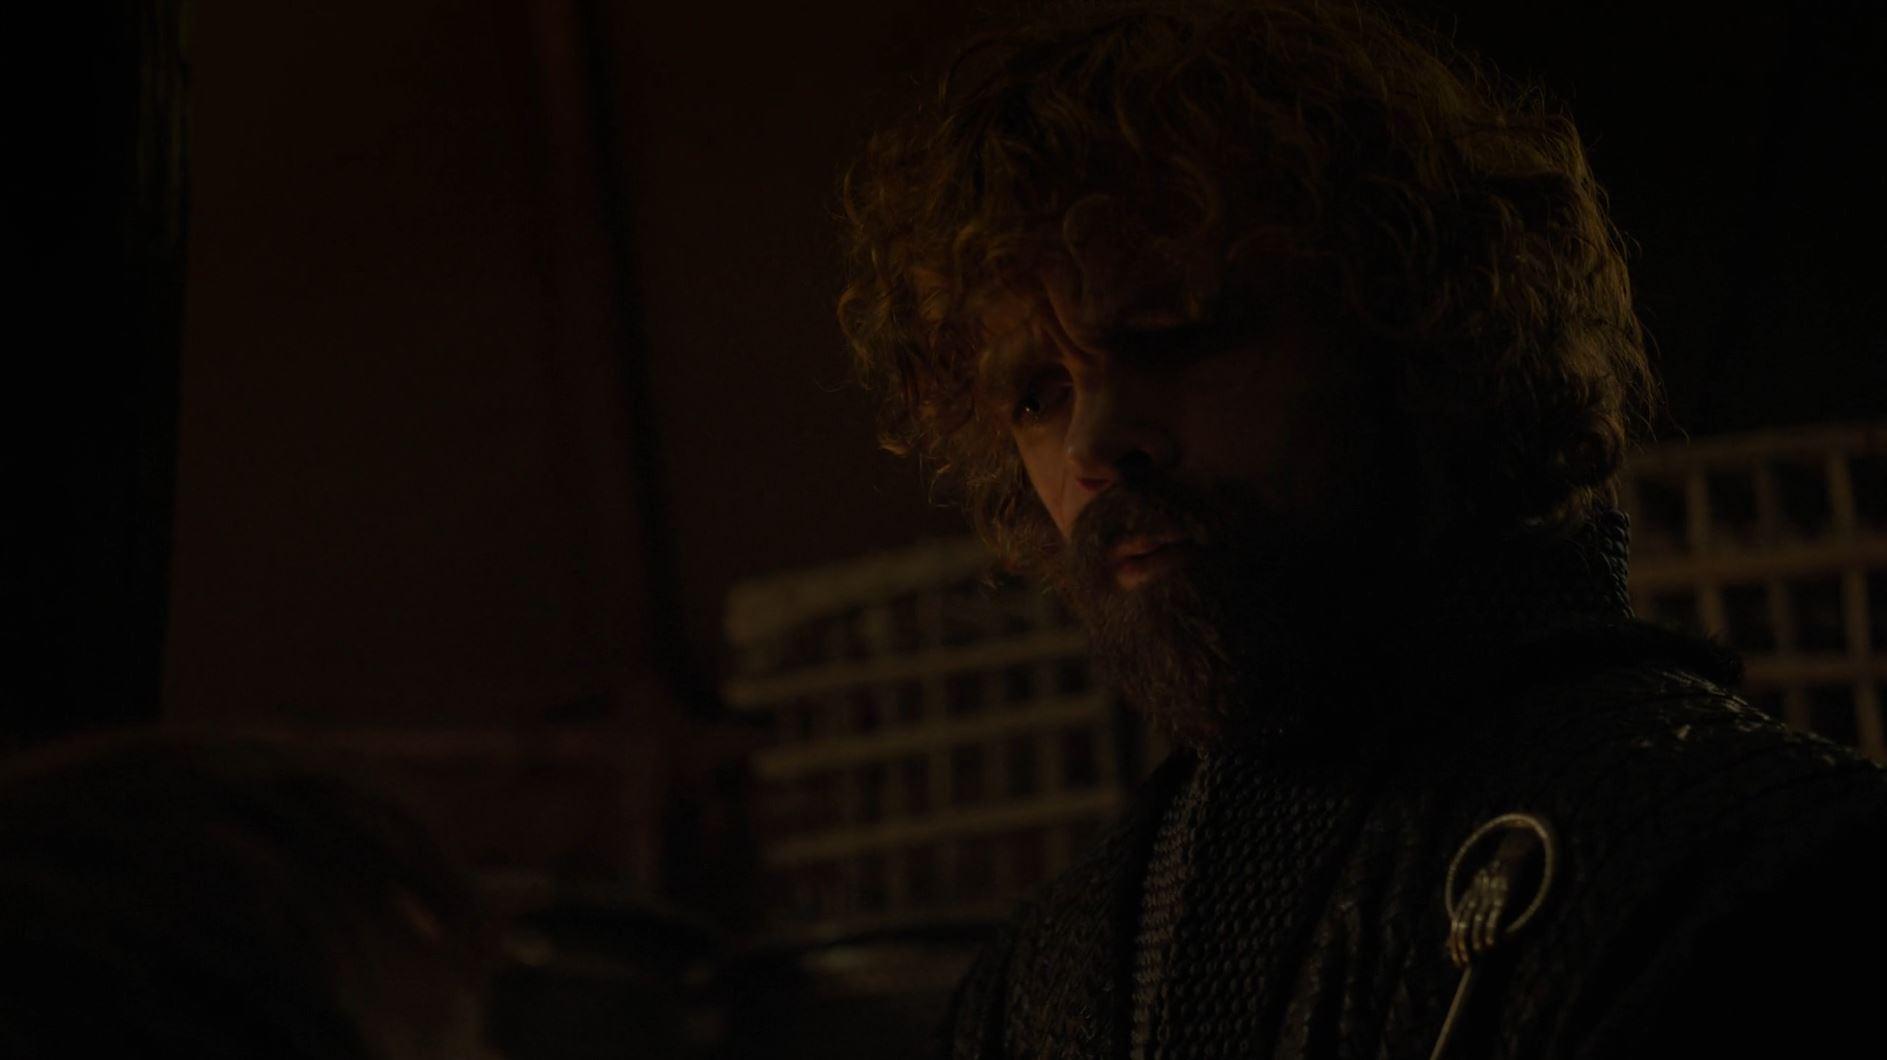 Game Of Thrones Season 8 Episode 5 Analysis The Bells Slashgear